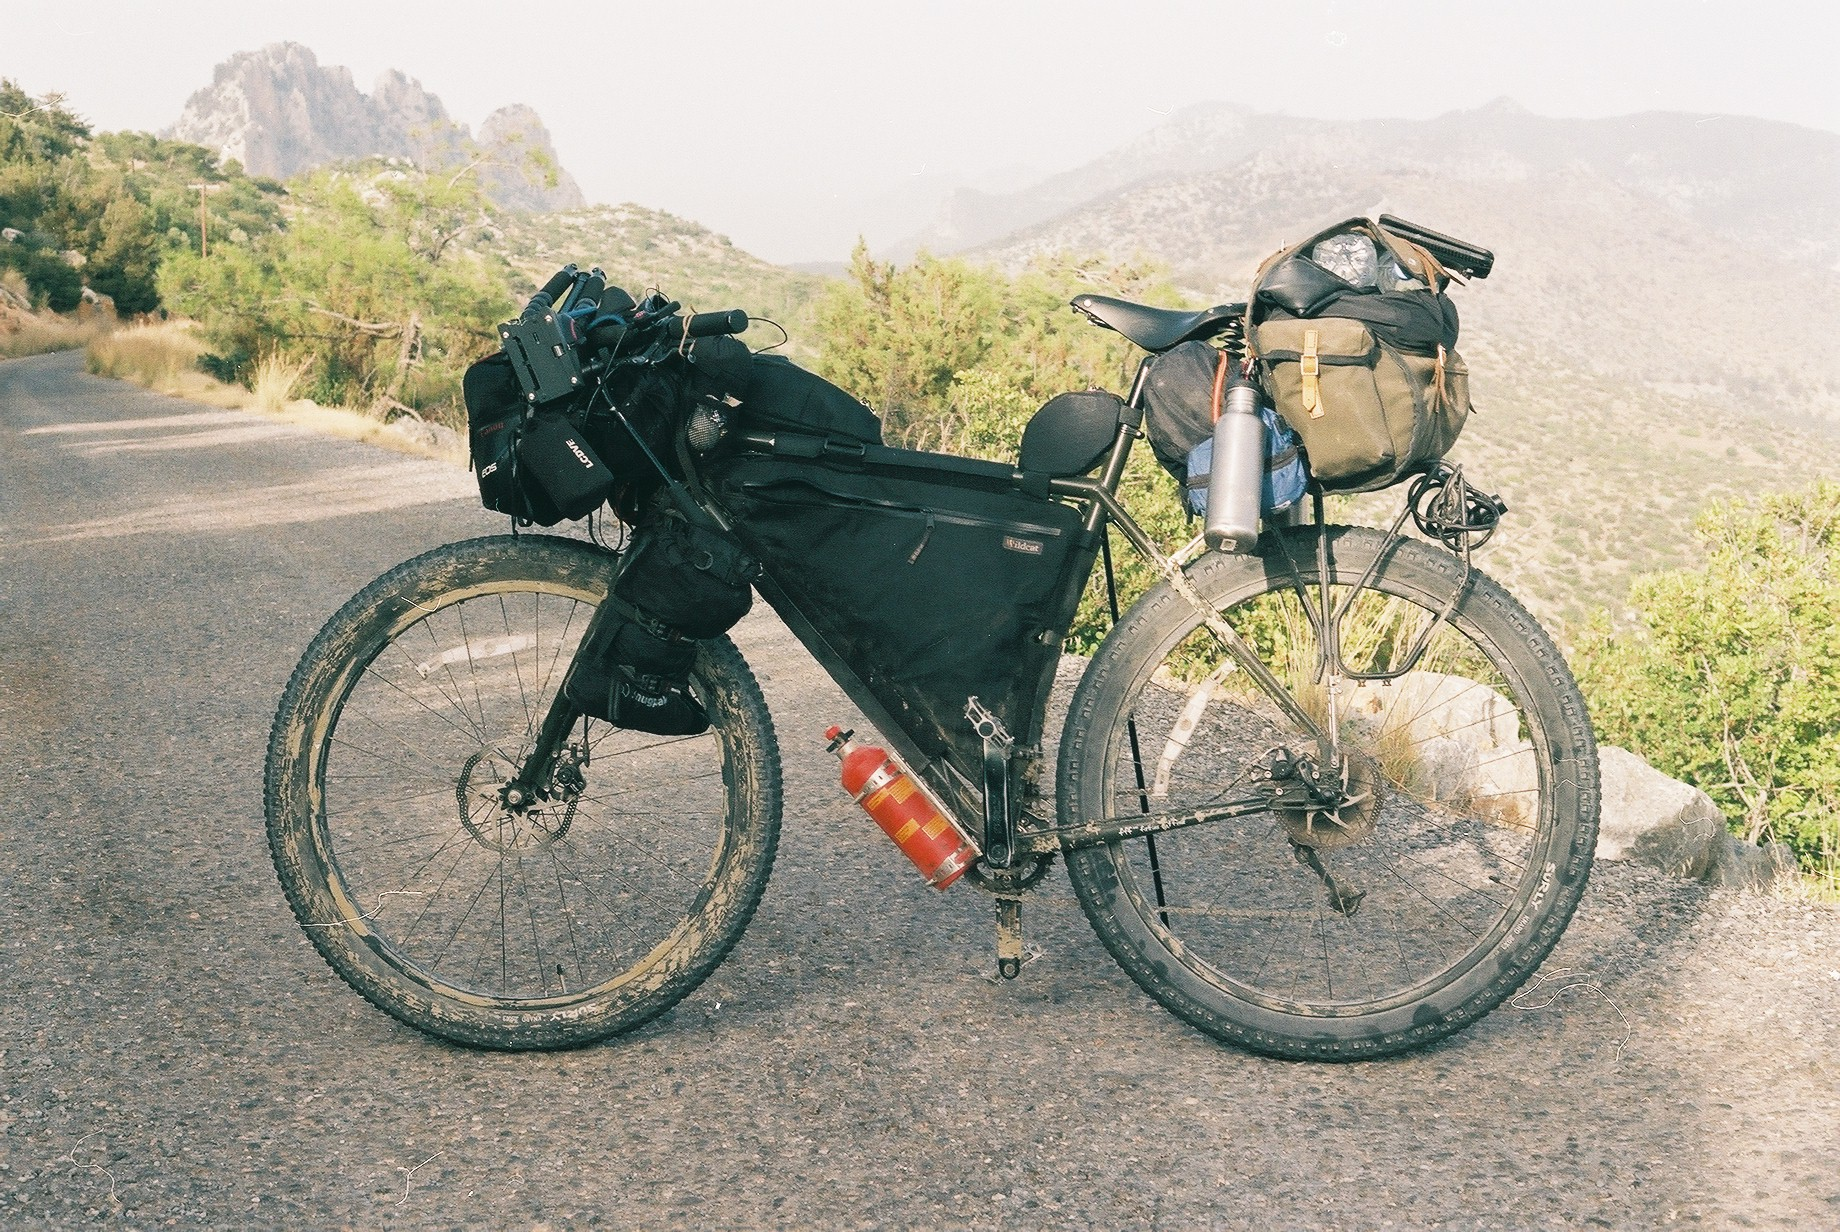 surly, surly ear, ear, surly bikes, 29er, mob, mountain bike, bike packing blog, bicycle touring apocalypse, bikepacking cyprus, bikepacking greece, ecr, knards, revelate designs, carradice, trangia, film photography, jack macgowan, go north cyprus, canon ae1